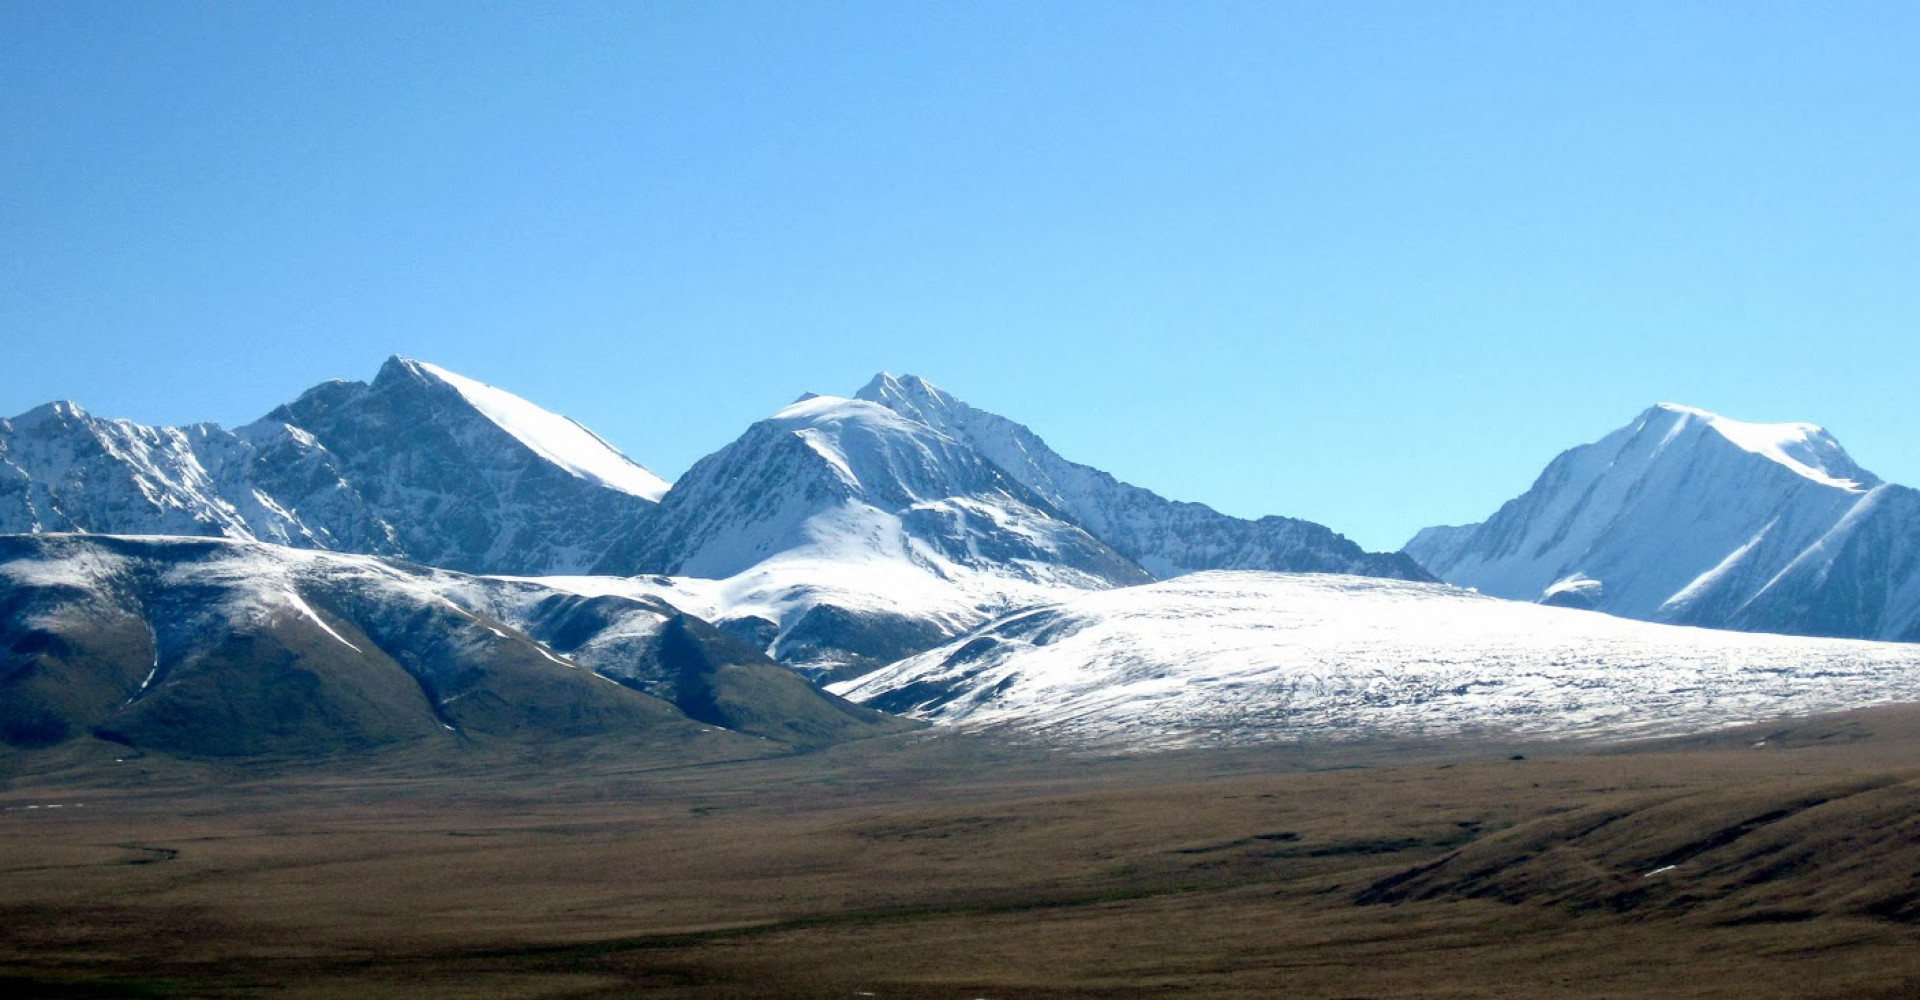 Kharkhiraa and Turgen Mountains